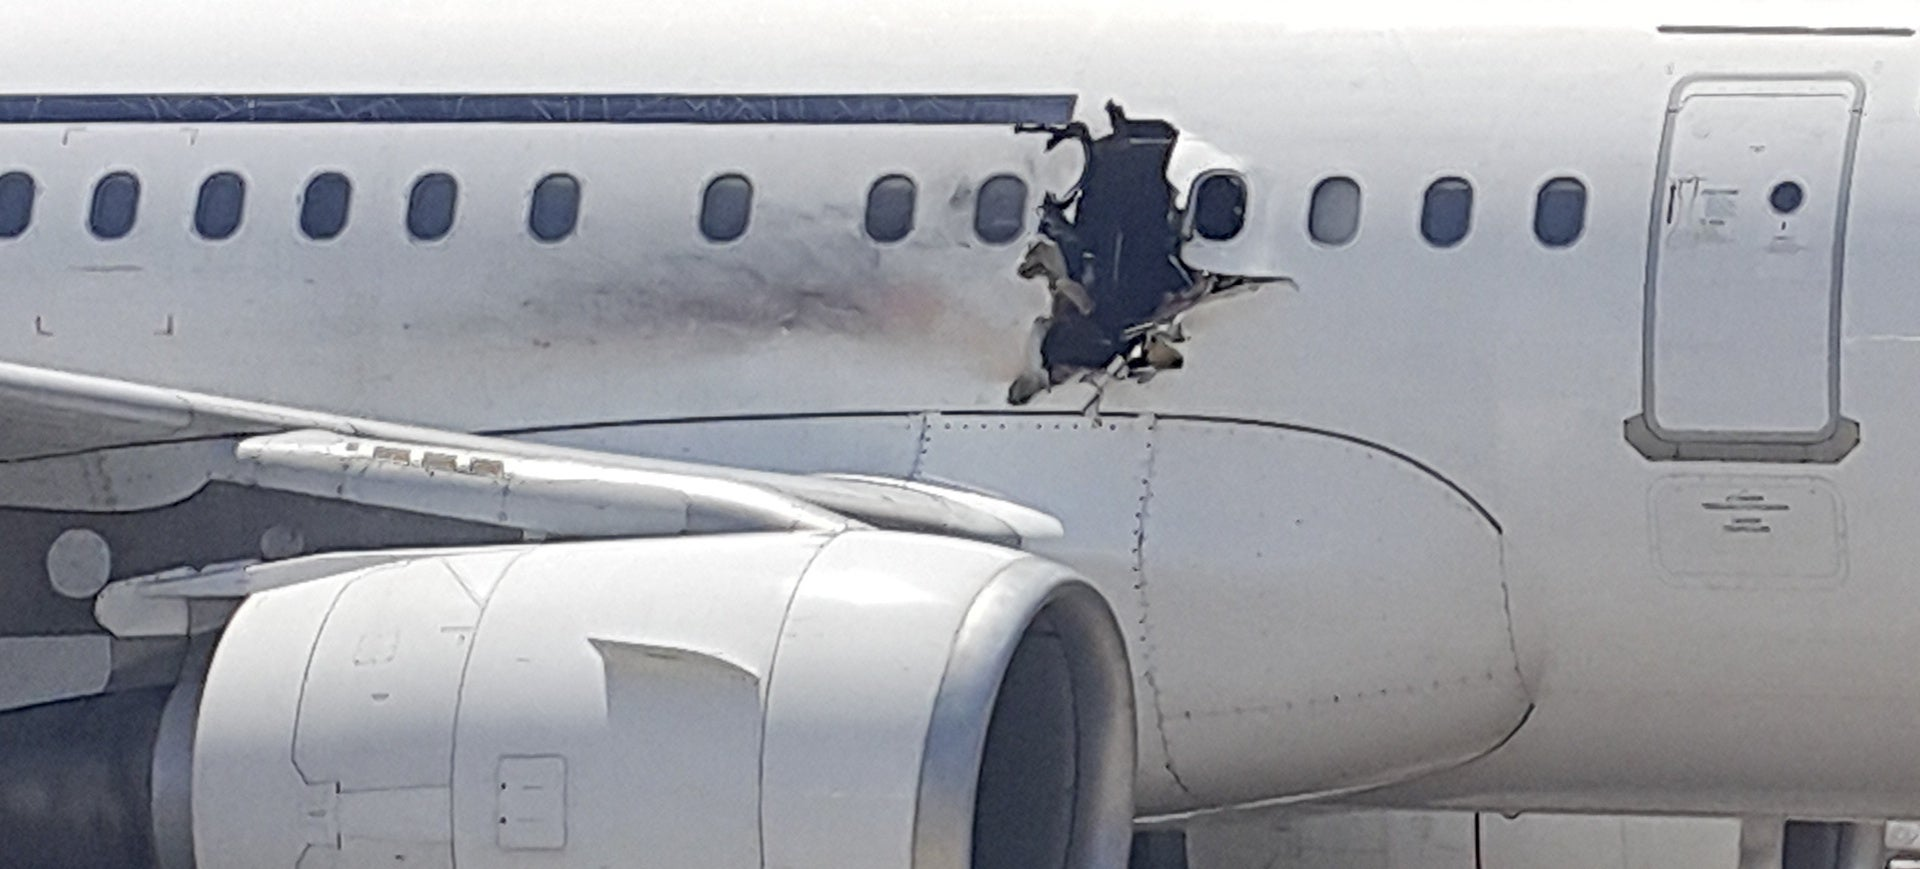 Aeroplane Makes Safe Landing Despite Having Huge Hole Blown in Fuselage